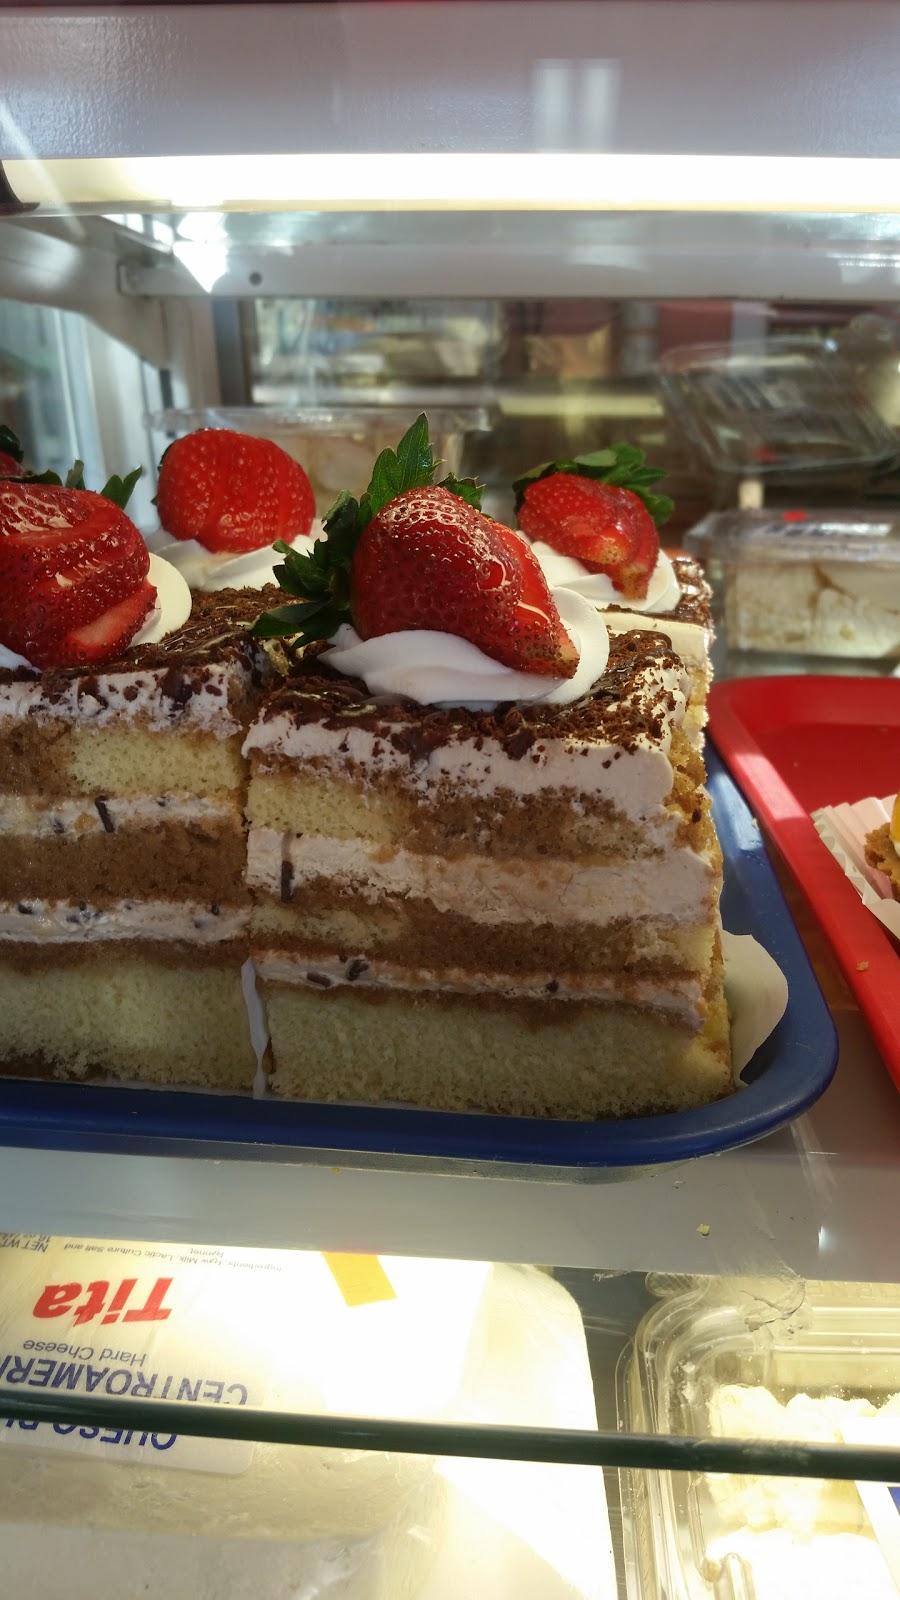 Caramelo Bakery - bakery  | Photo 6 of 10 | Address: 11301 Georgia Ave, Silver Spring, MD 20902, USA | Phone: (301) 942-9330